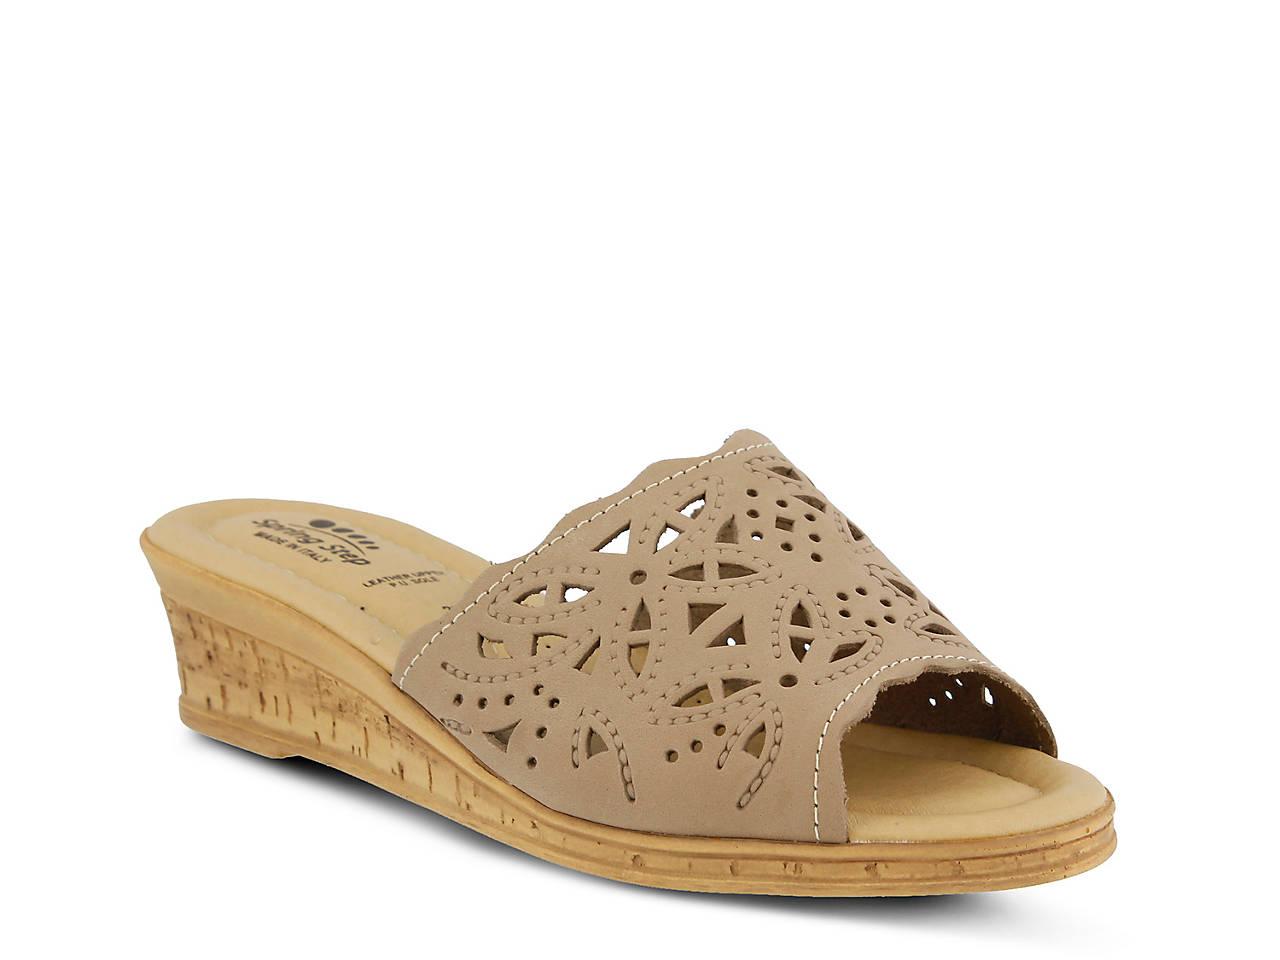 Spring Step Estella Women's ... Wedge Sandals o4kNU4t